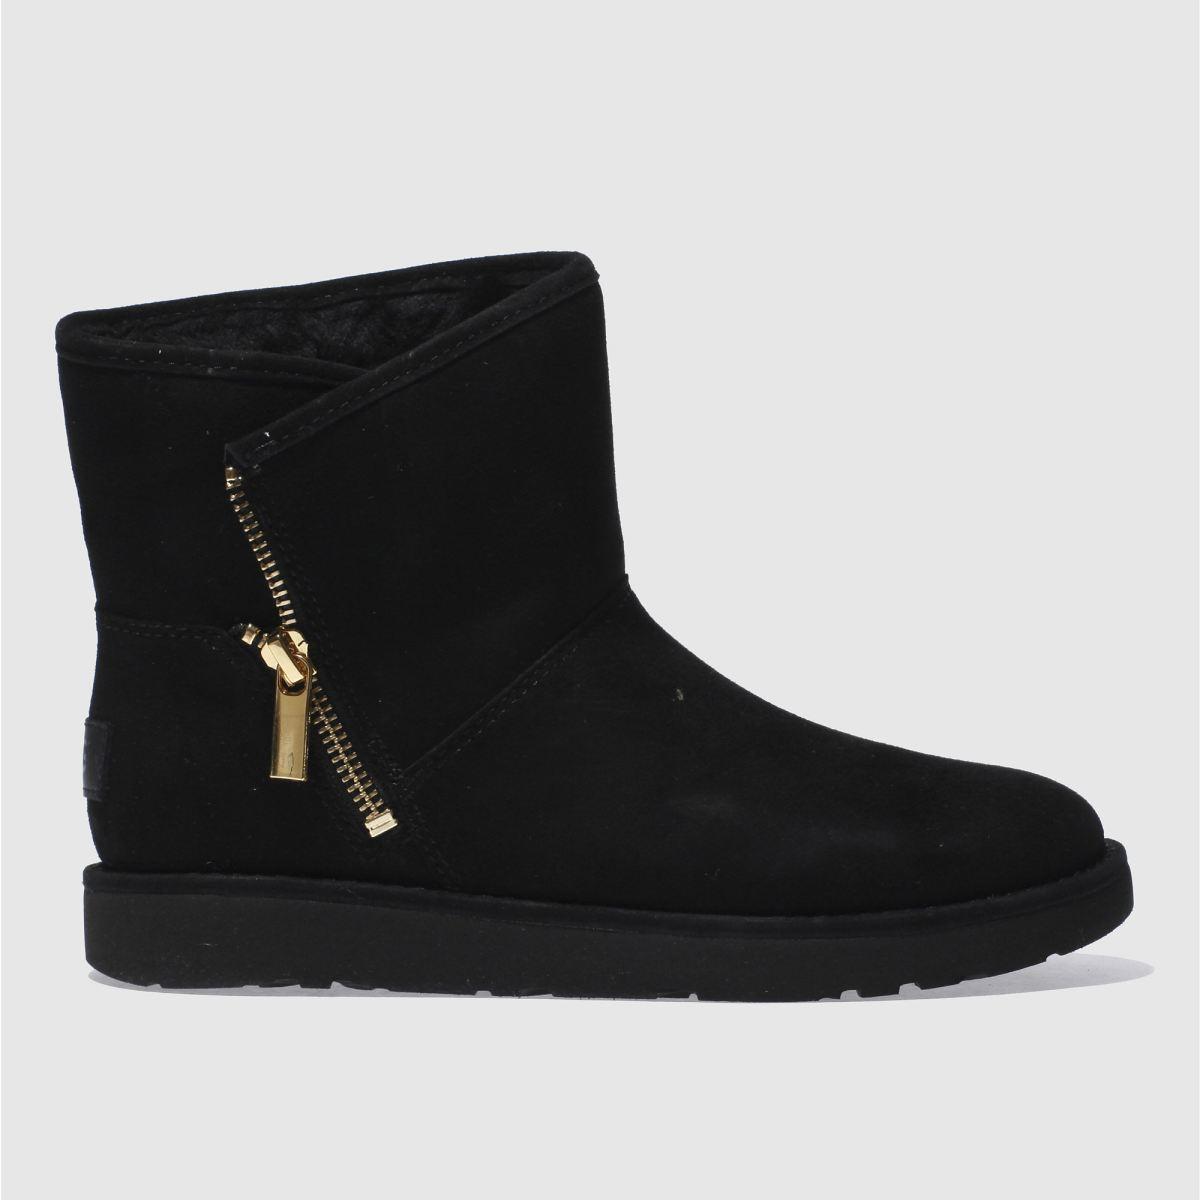 Ugg Black Kip Boots